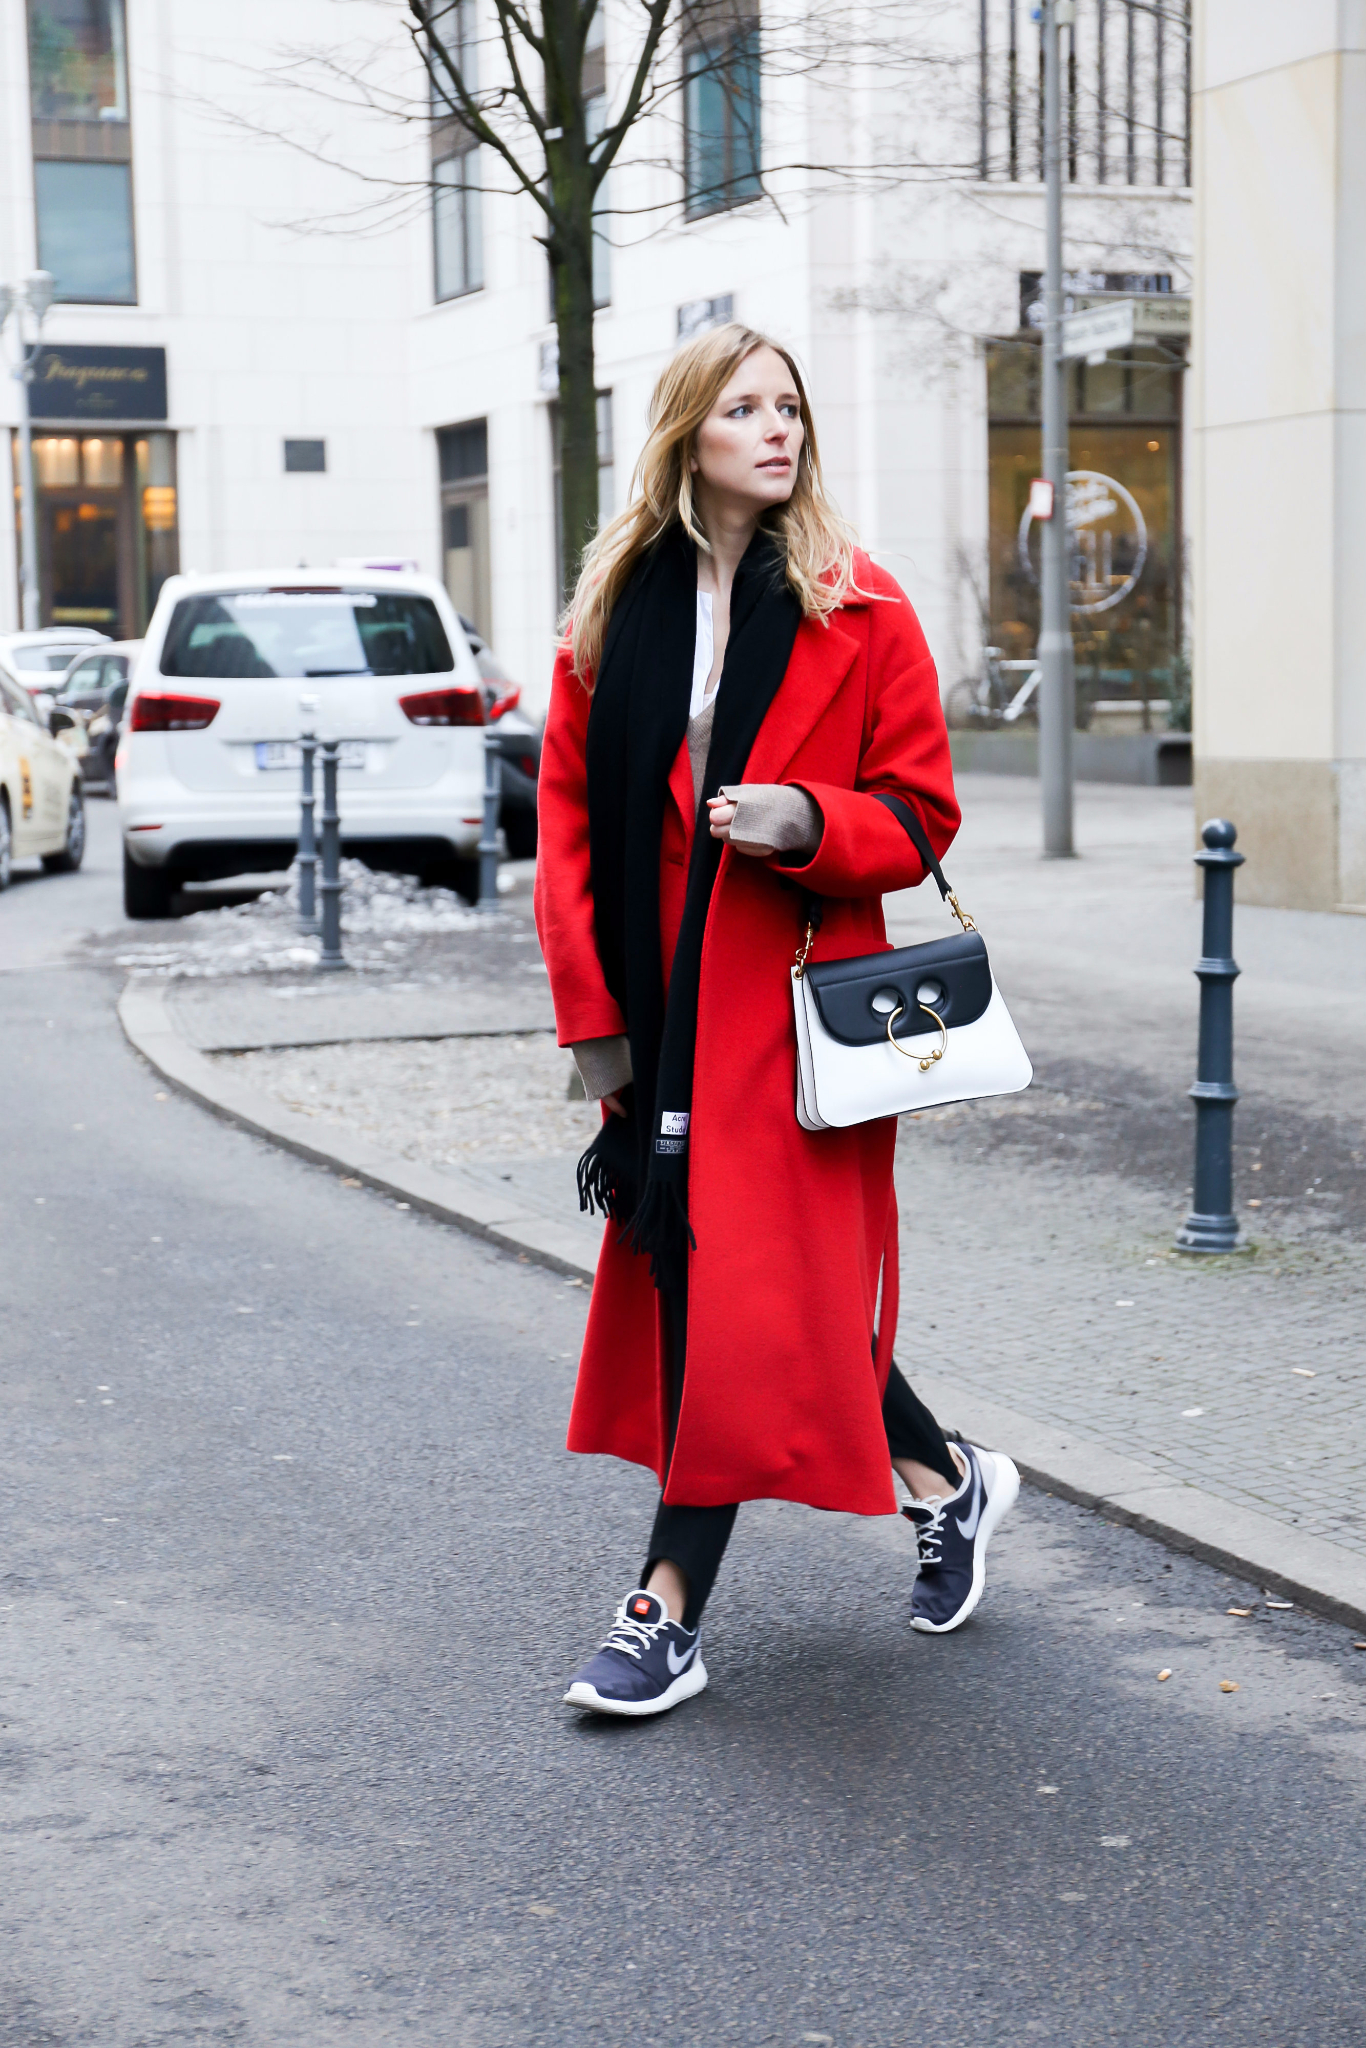 MOD-by-Monique-Fashion-Looks-MBFWB-Look-#2-33